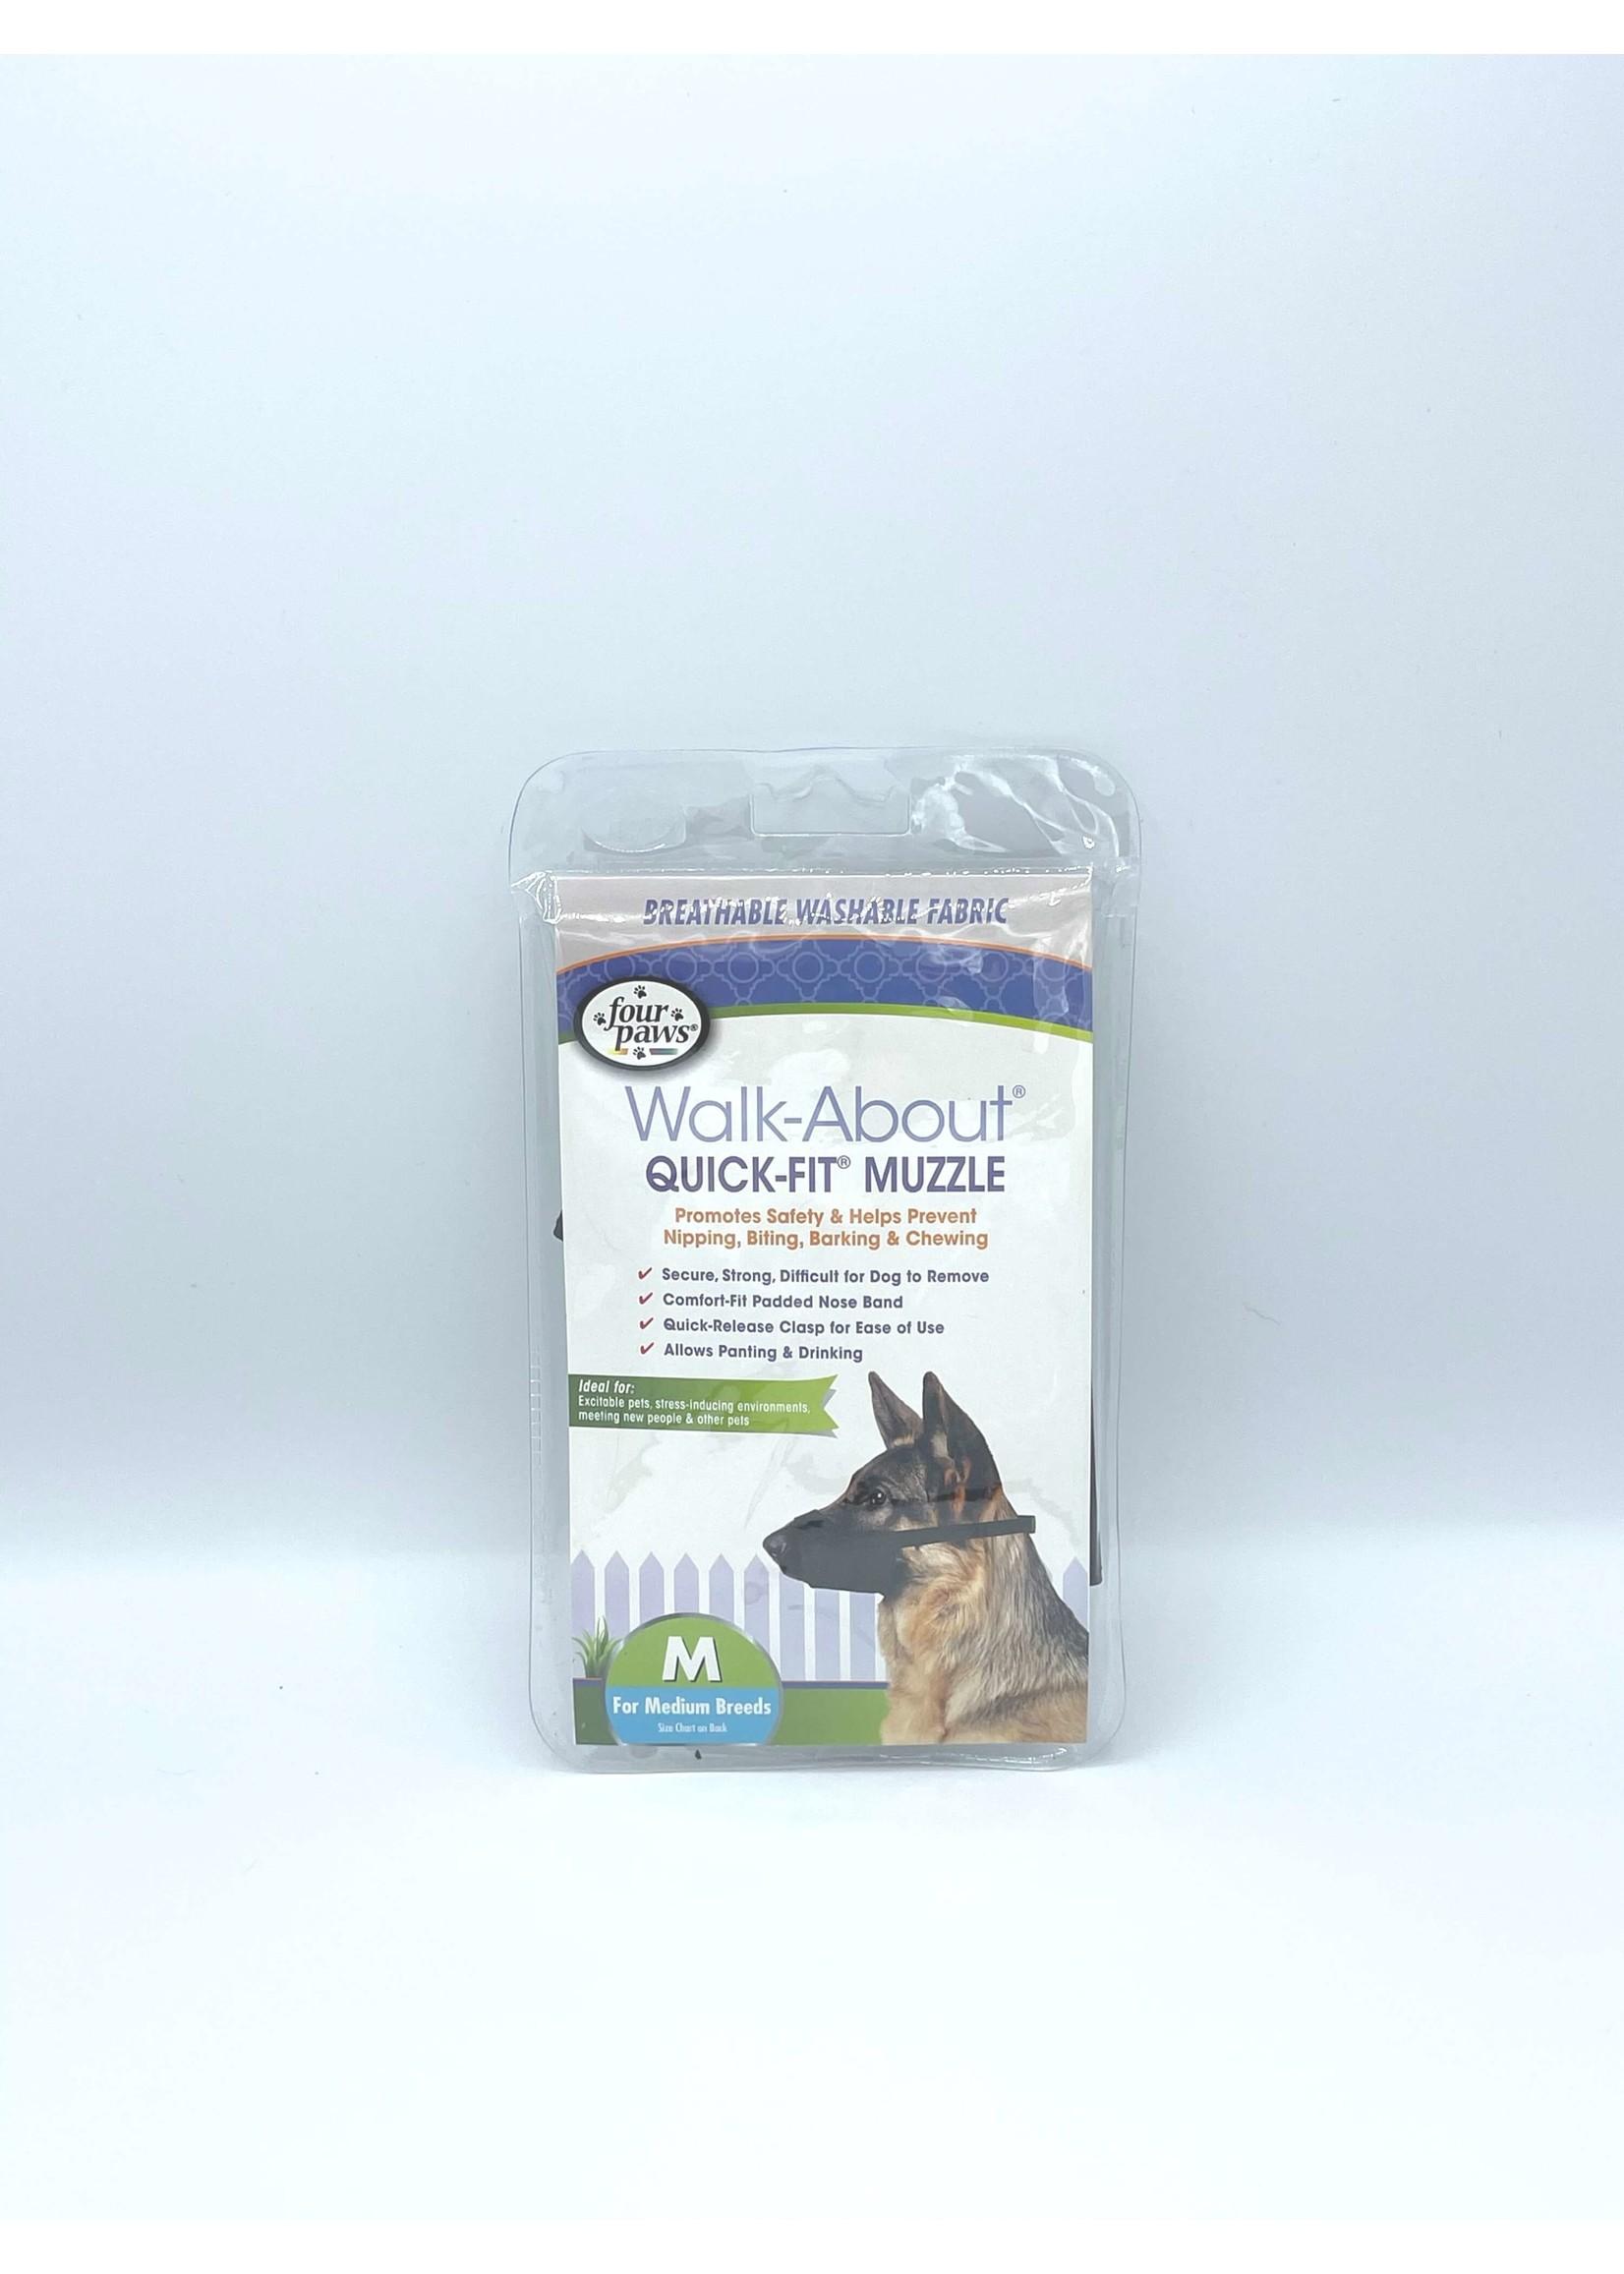 Walk-About Quick-Fit Muzzle - Medium Breeds